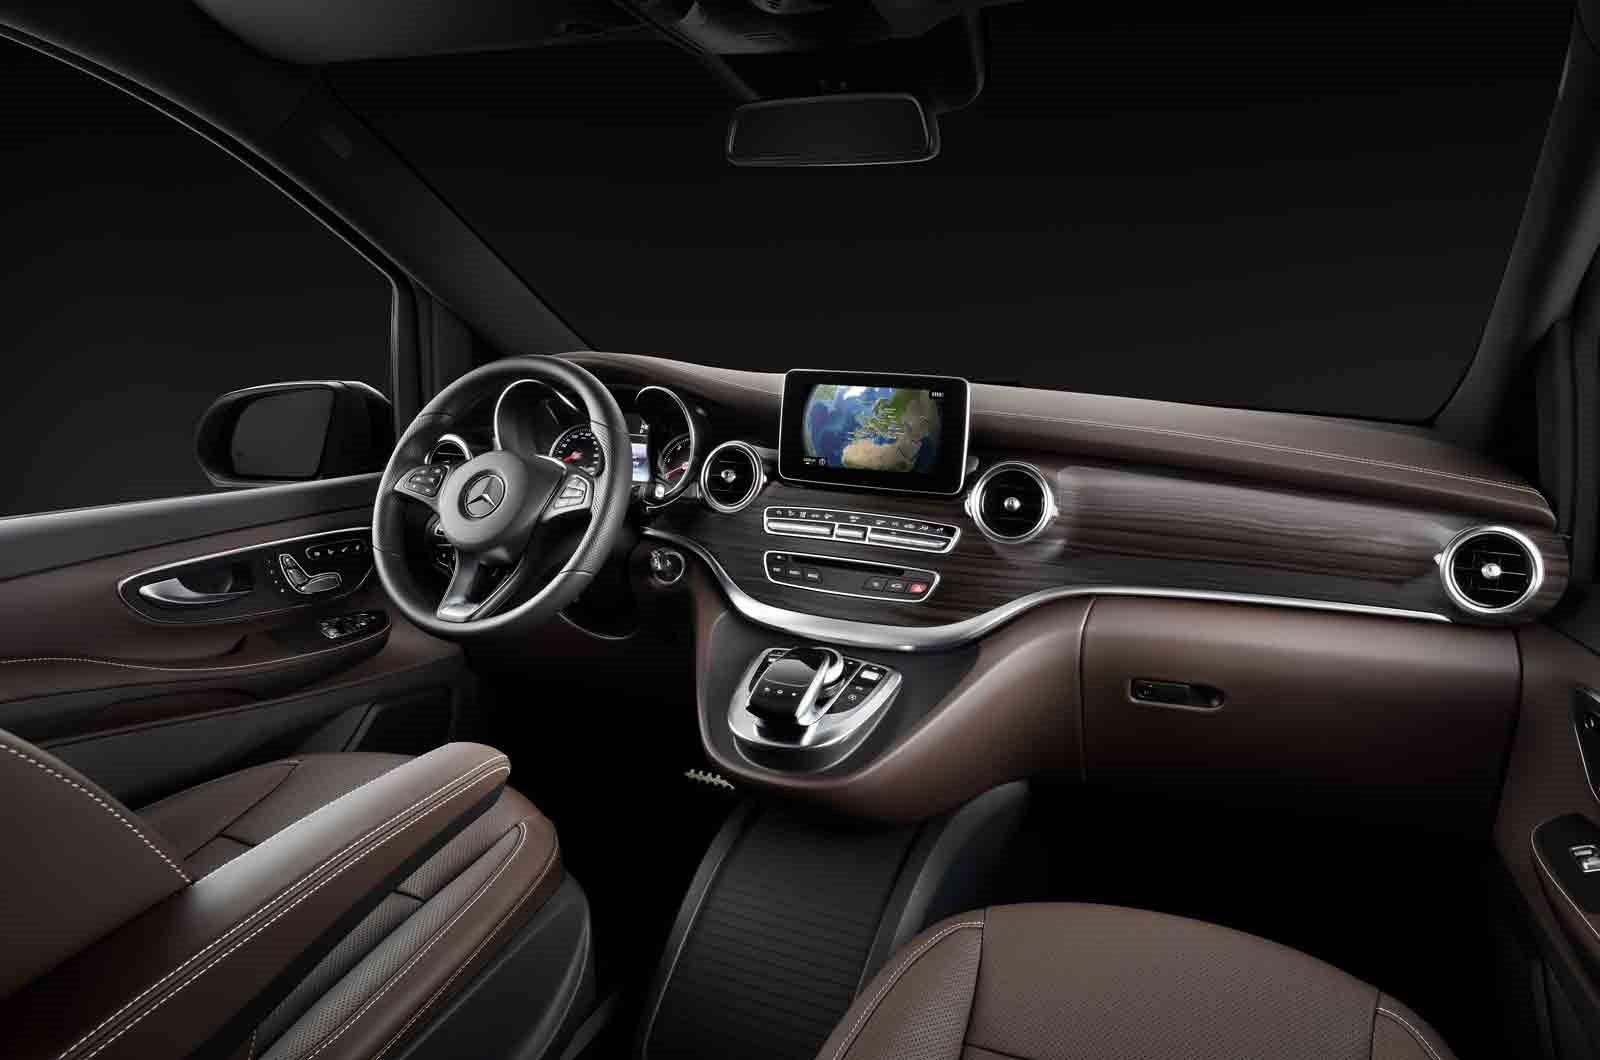 Interieur mercedes  Hususi Otomobil Ruhsatlı - Mercedes Vito 2.2 CDI